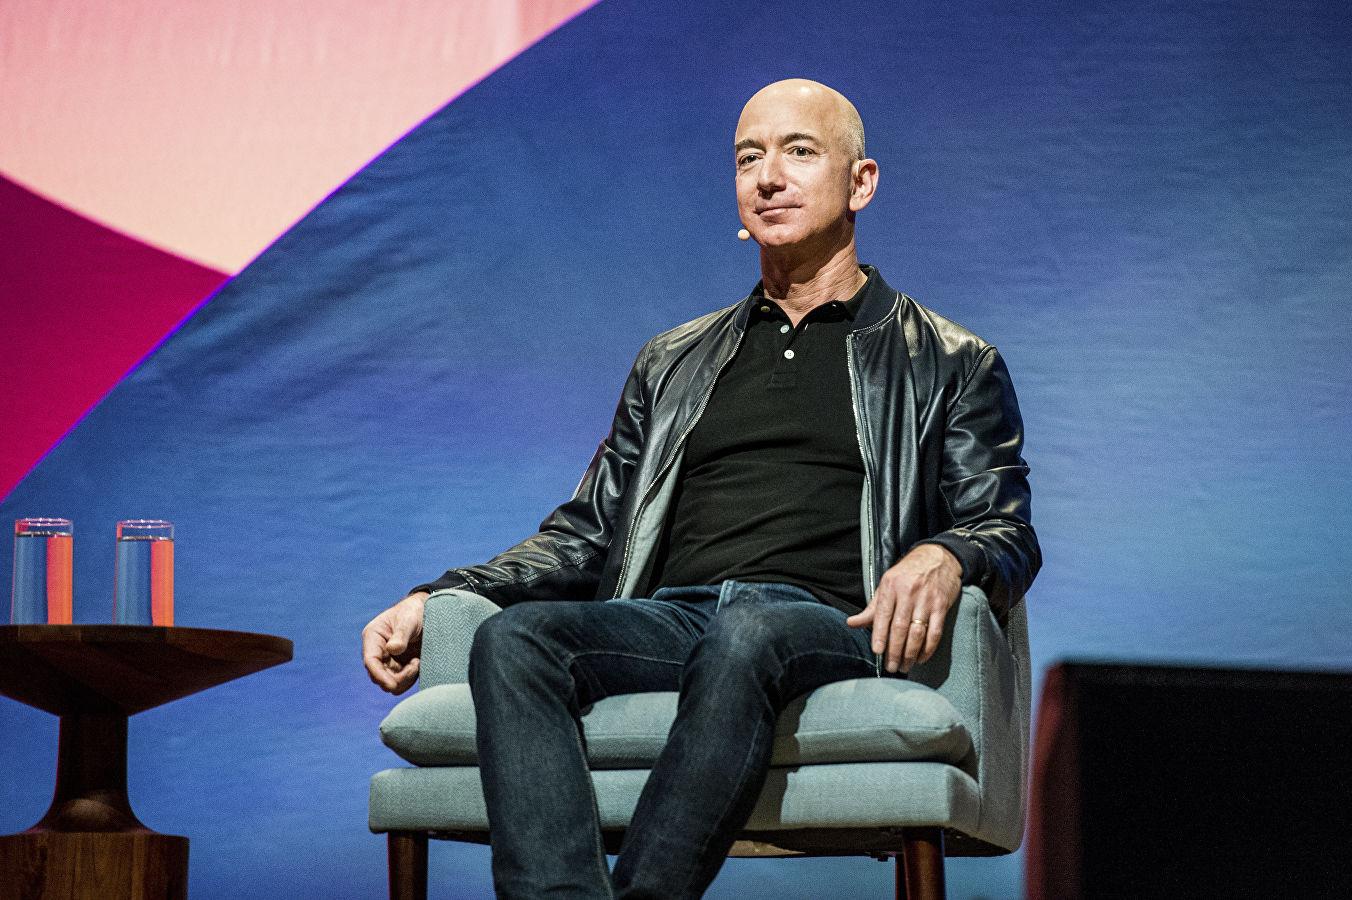 Глава Amazon нанял детективов